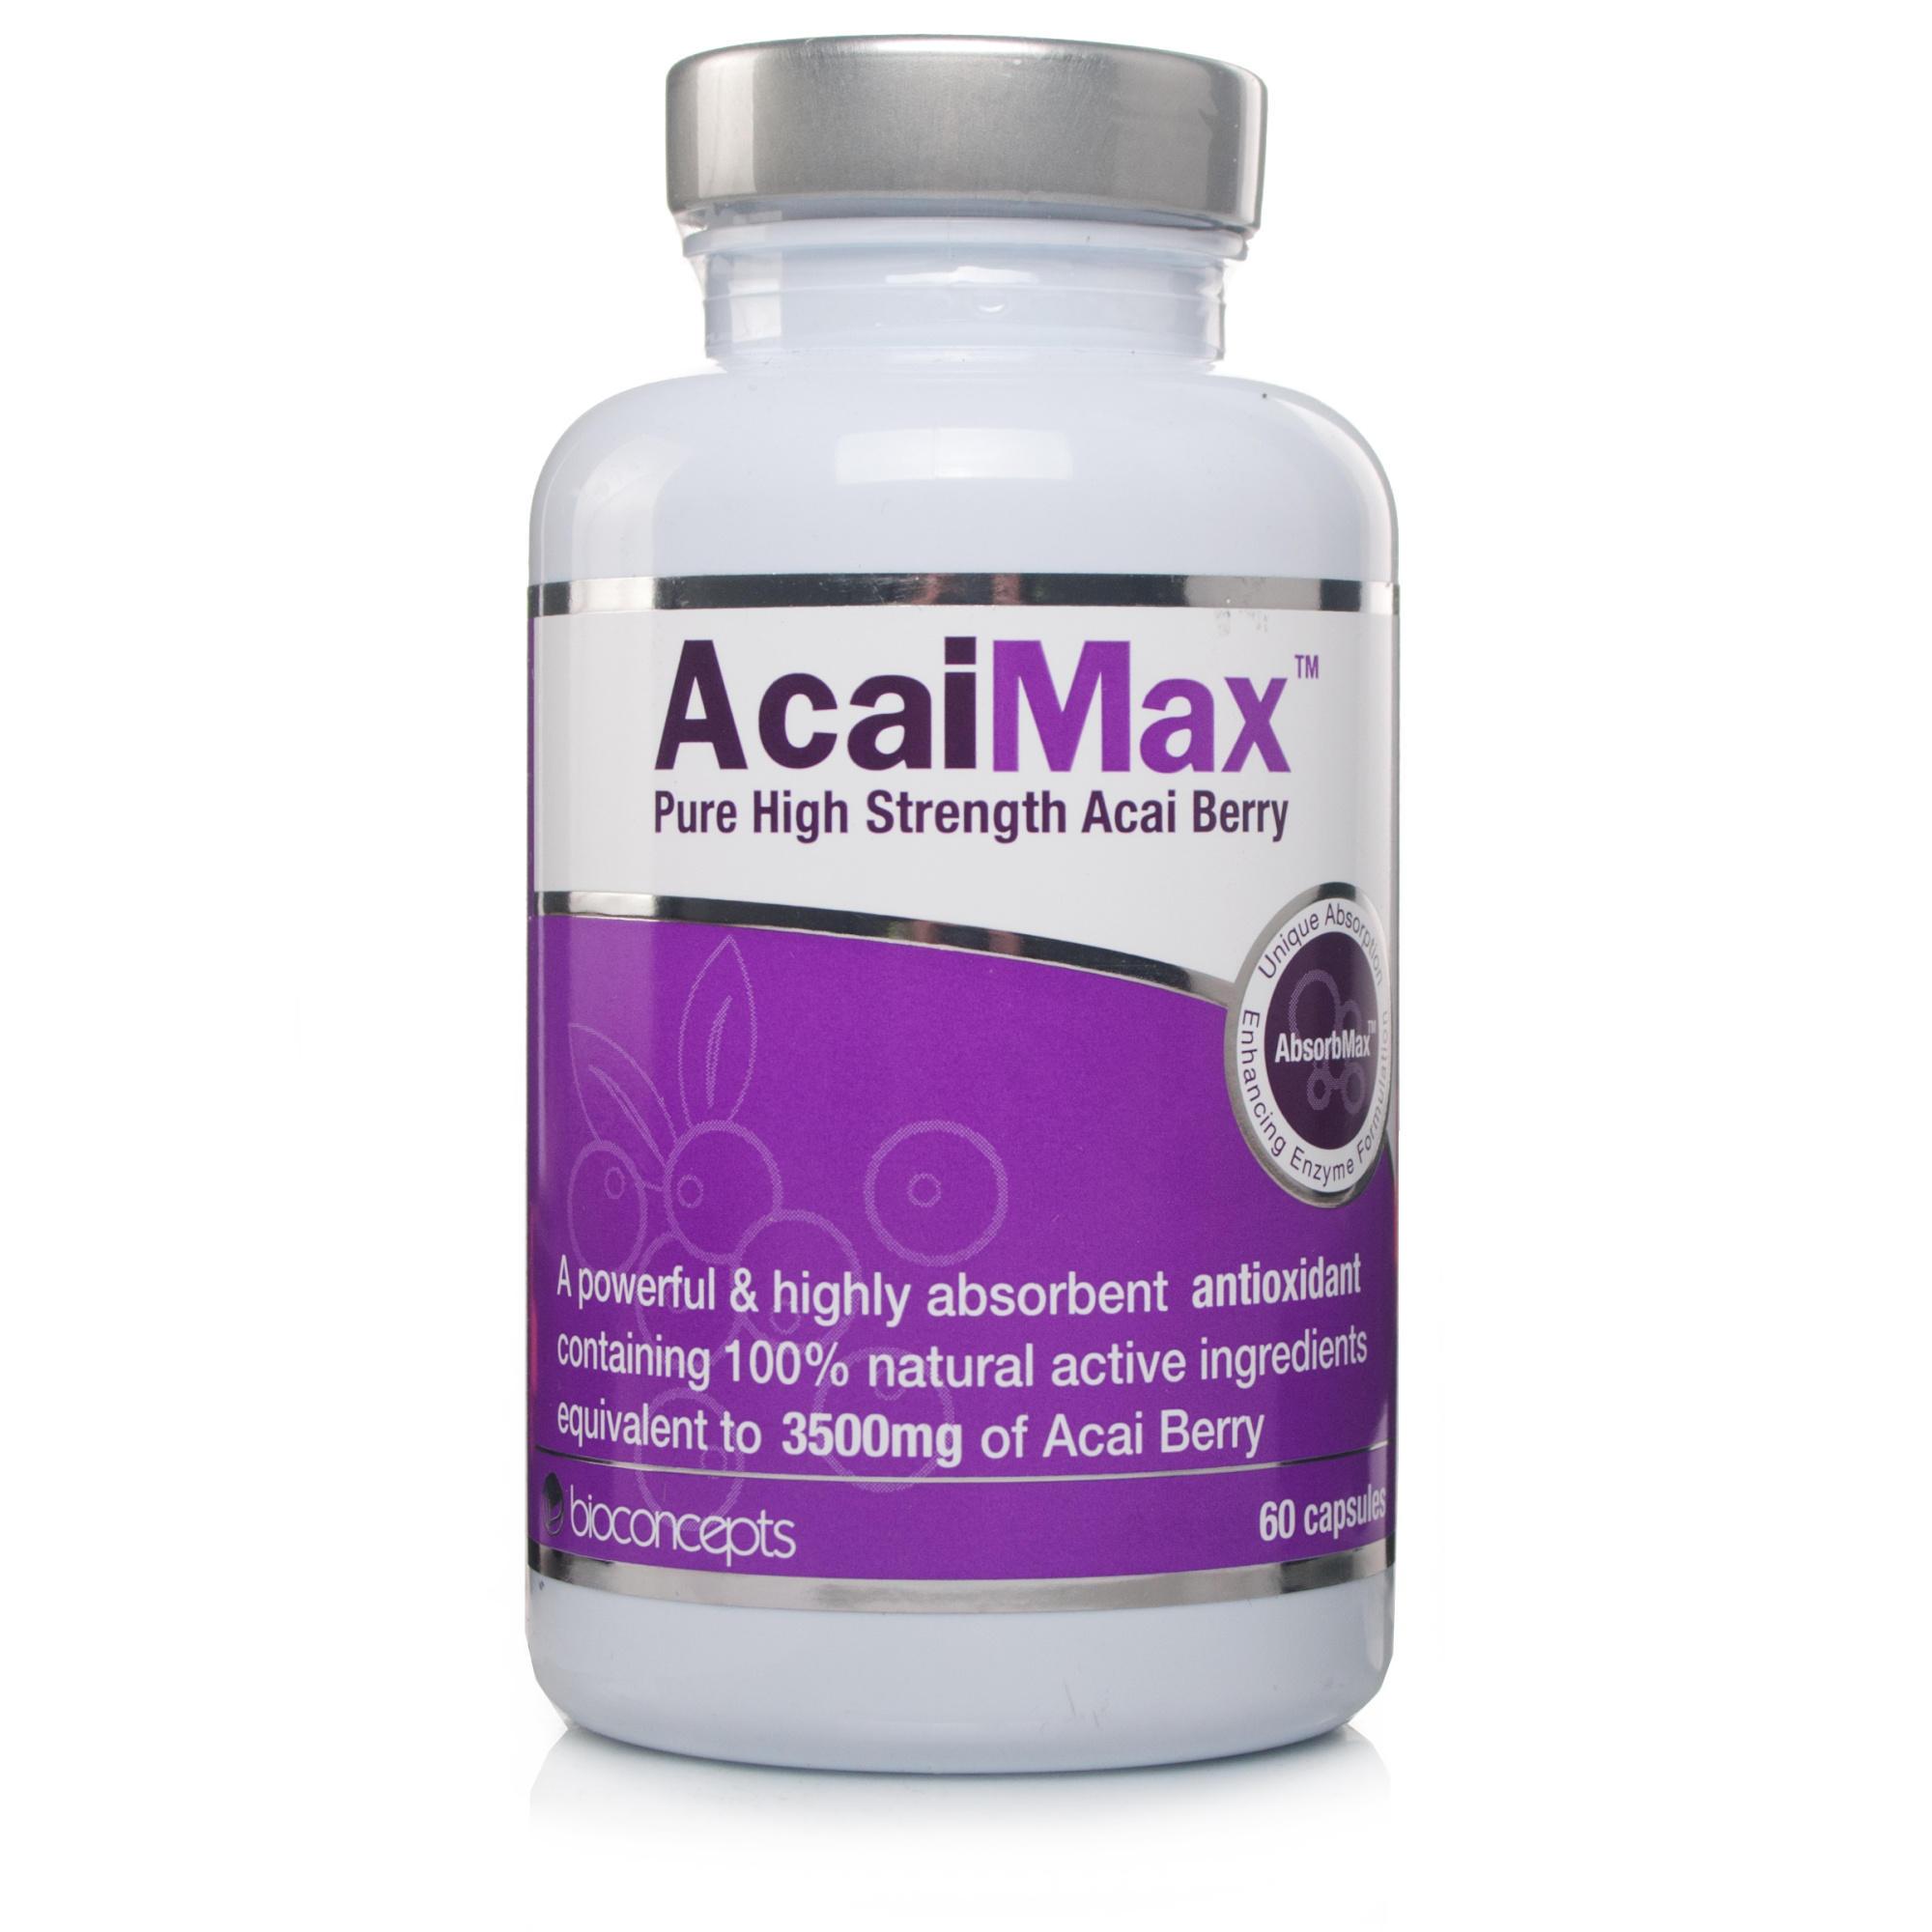 Stockists of AcaiMax Pure High Strength Acai Berry